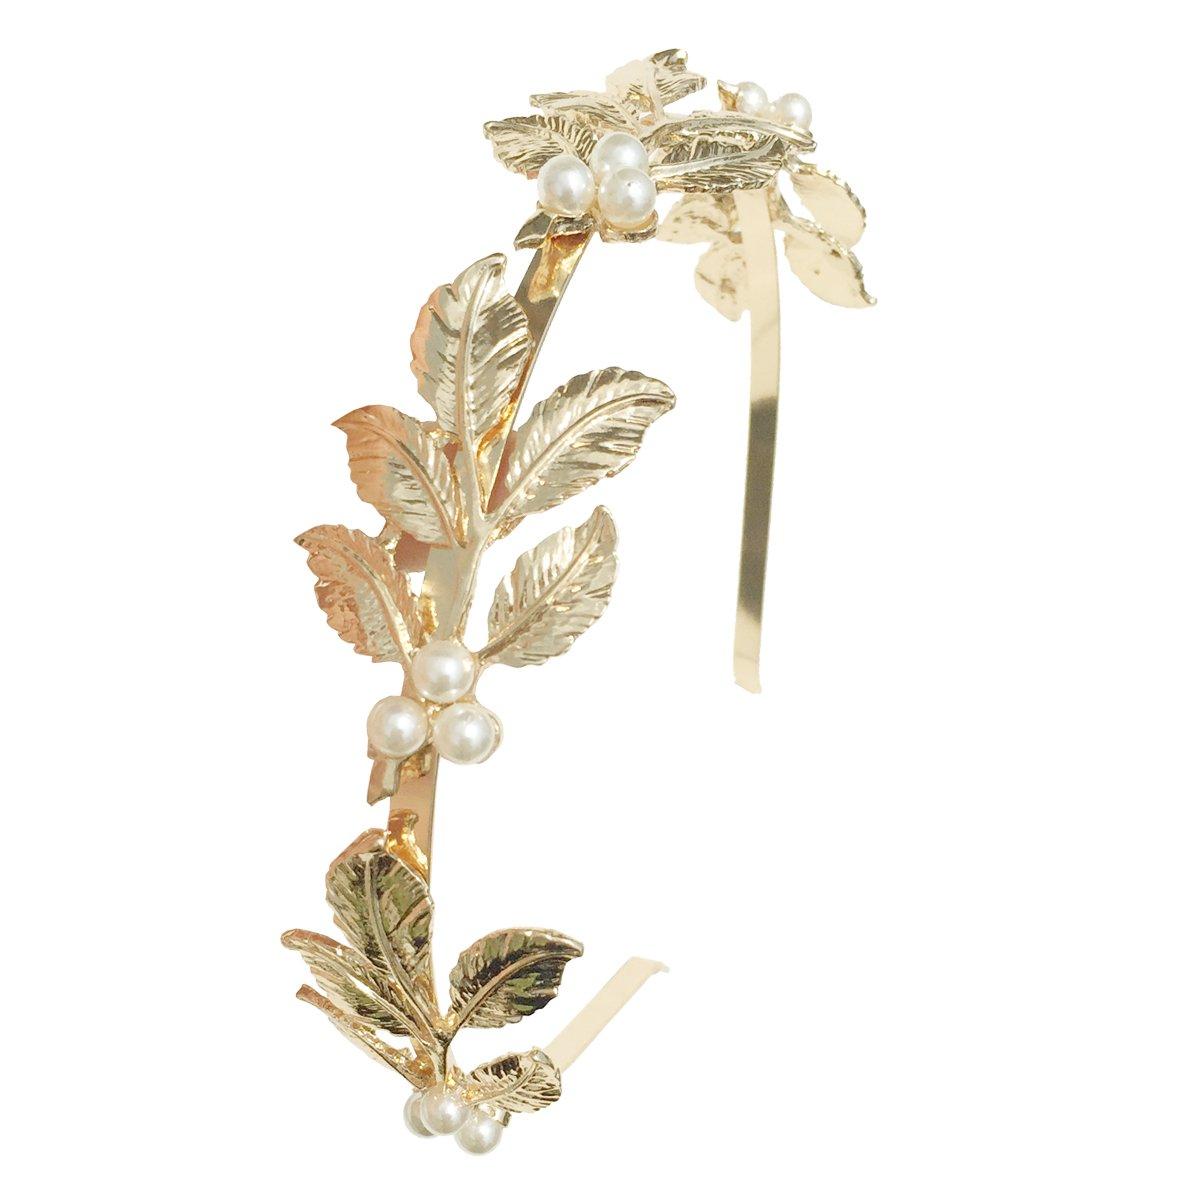 DRESHOW Roman Goddess Leaf Branch Dainty Bridal Hair Crown Head Dress Boho Alice Band, 2 pcs, Gold and Silver HB0008-3A